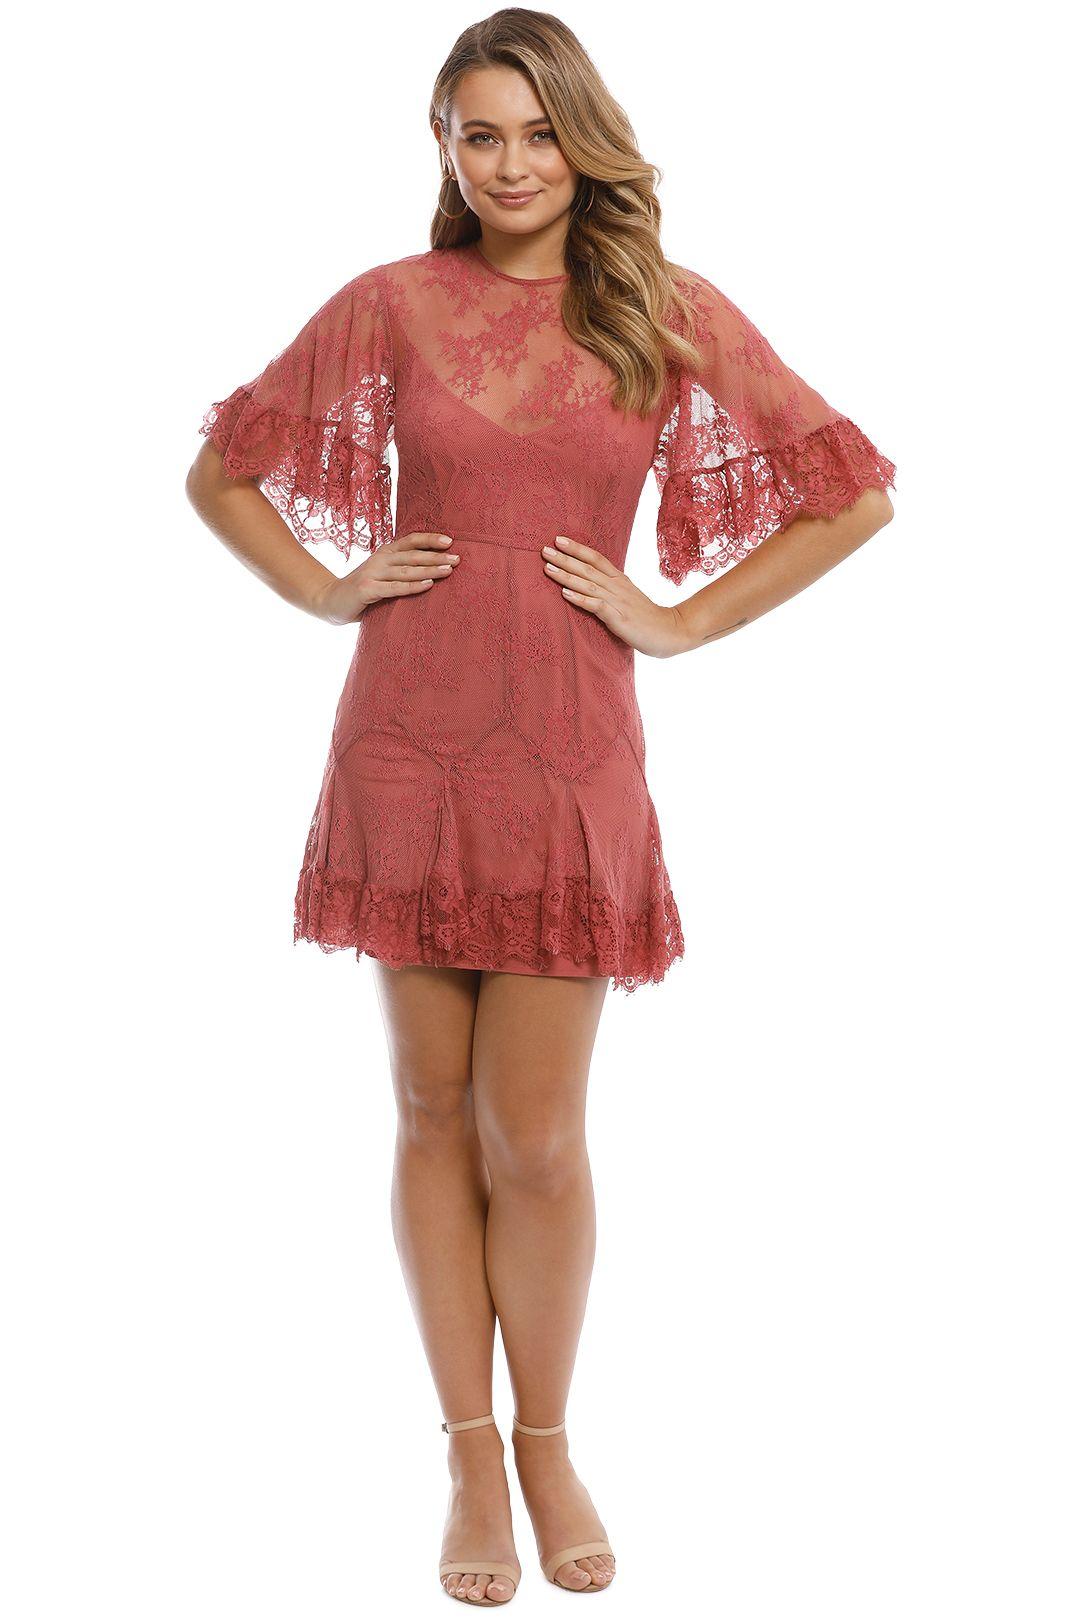 Talulah - Blind Love Mini Dress - Rosewood - Front